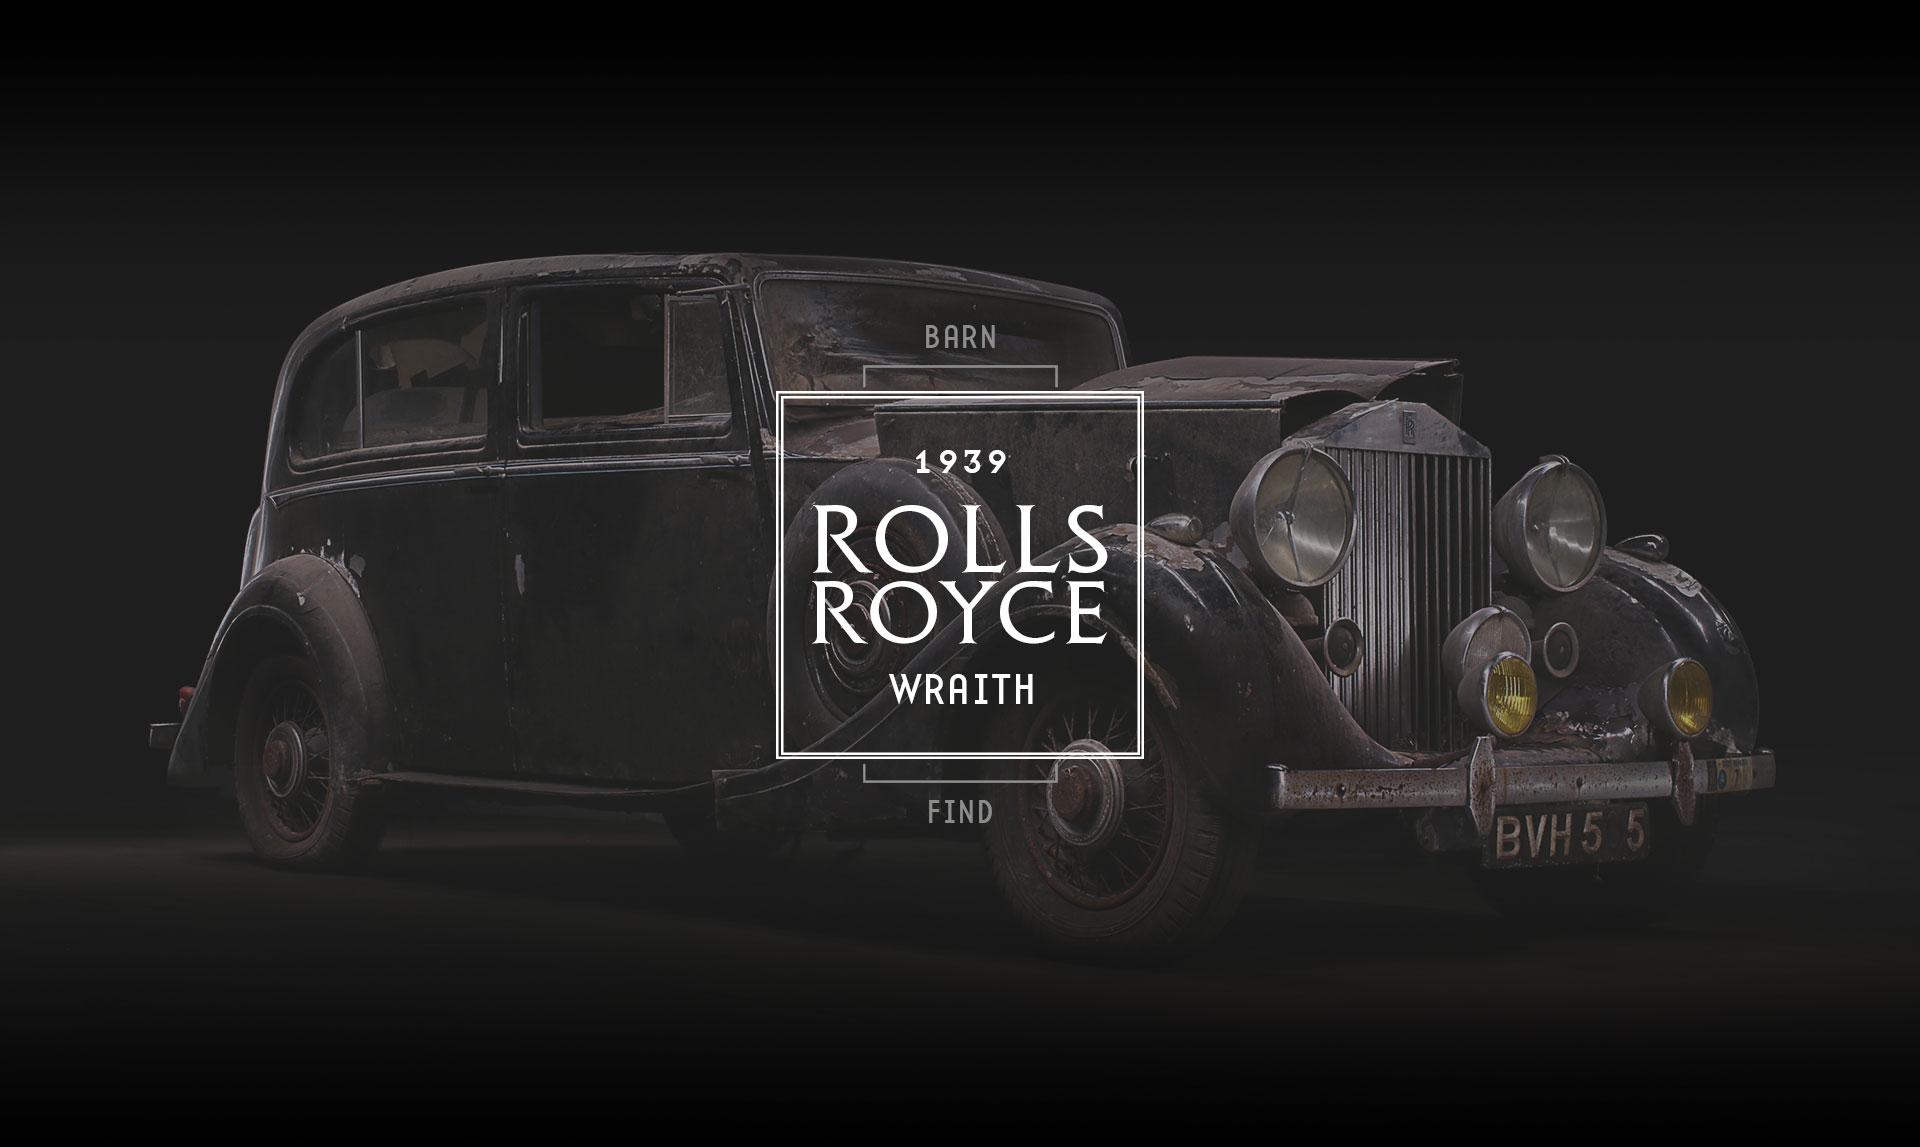 1939 Rolls Royce Wraith Restoration